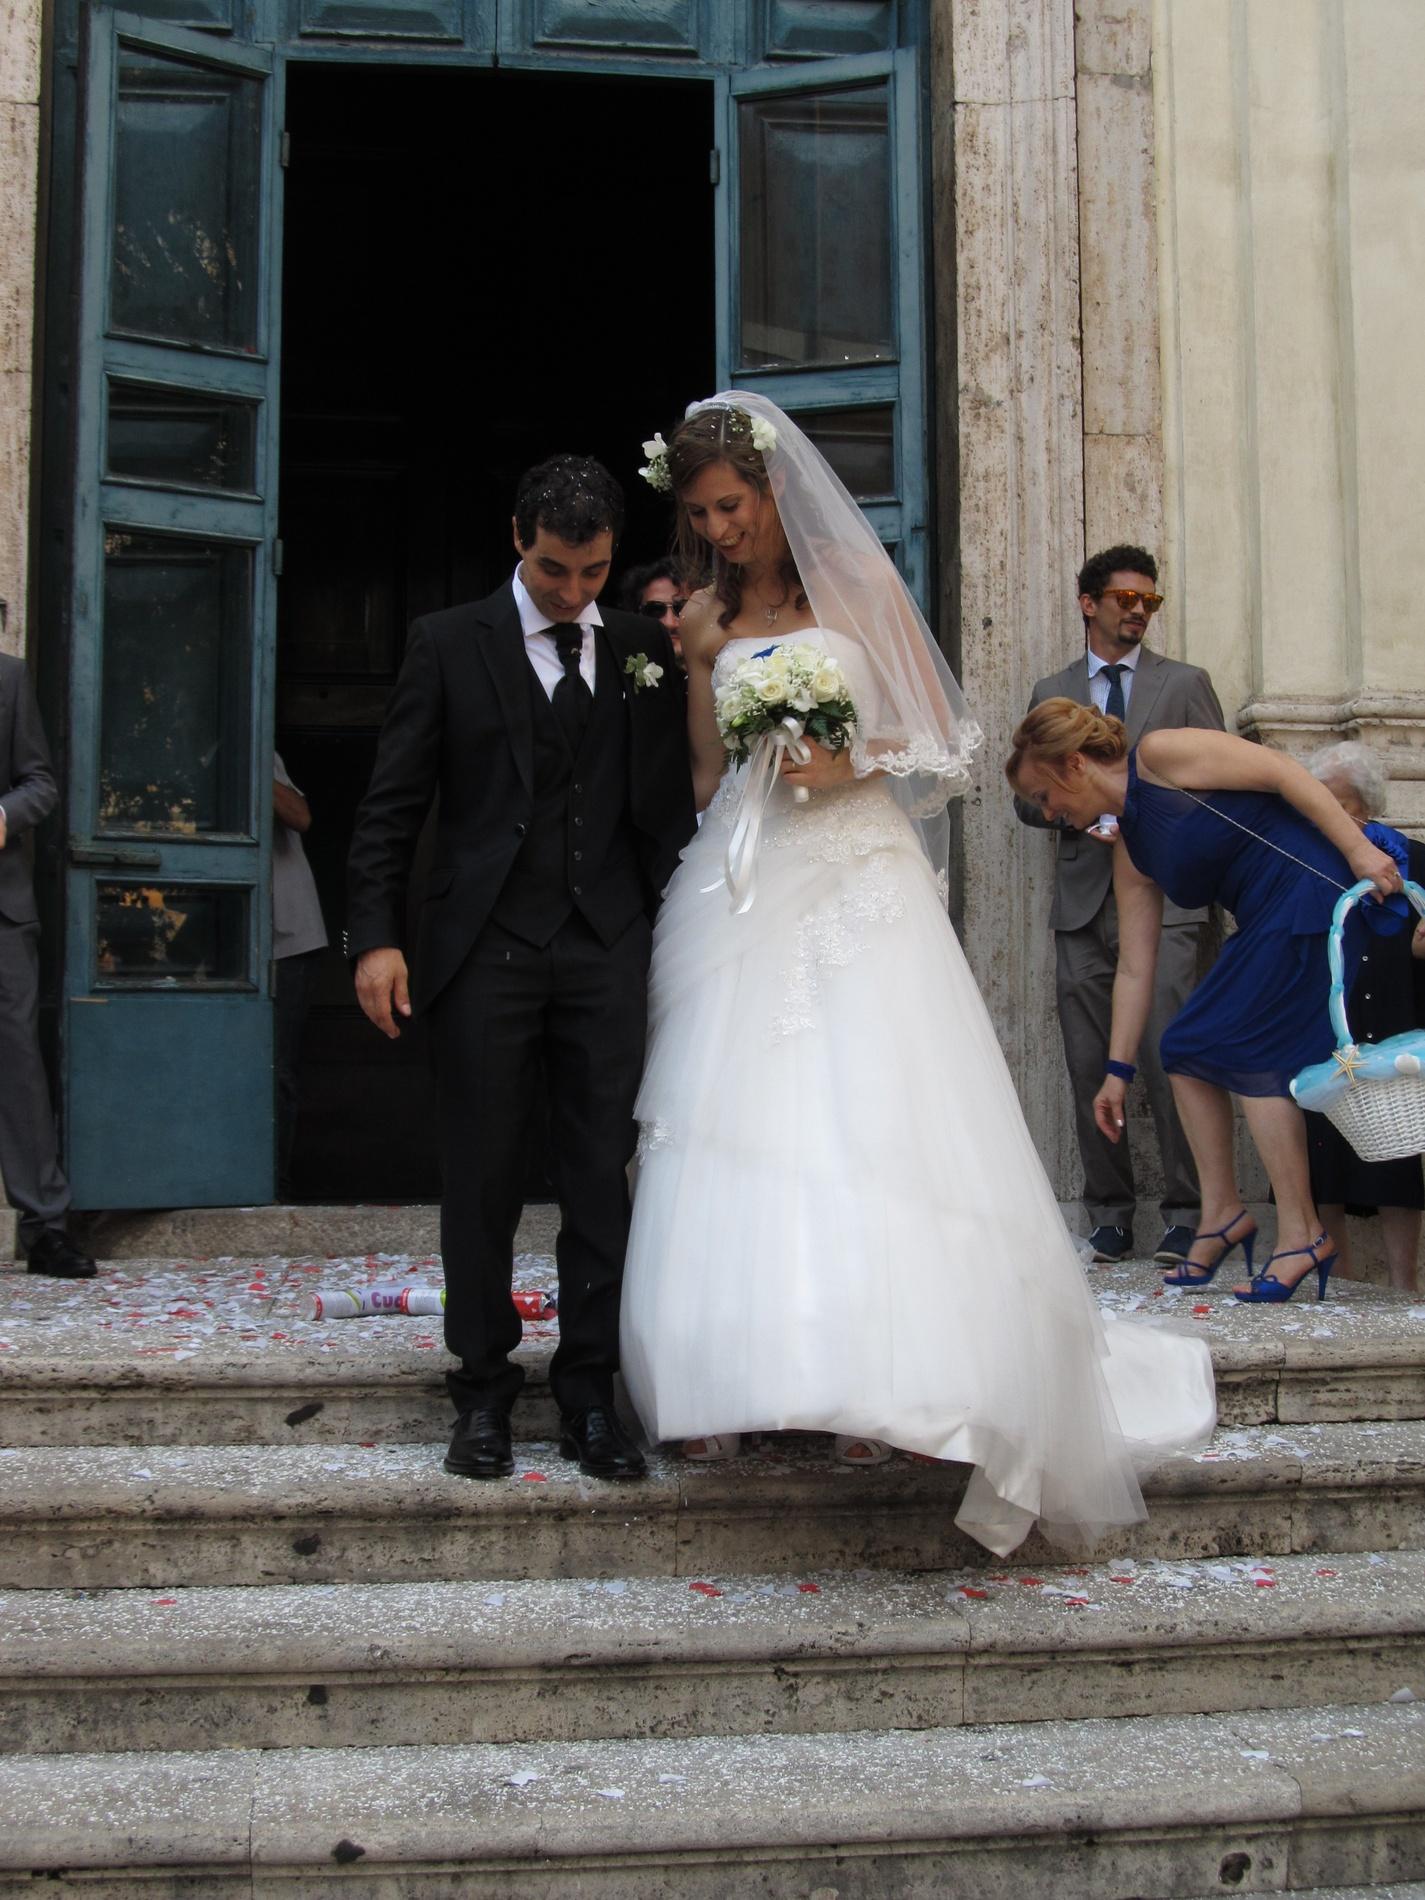 matrimonio-ilaria-torrisi-e-marco-di-lucia-2015-08-08-16-52-59